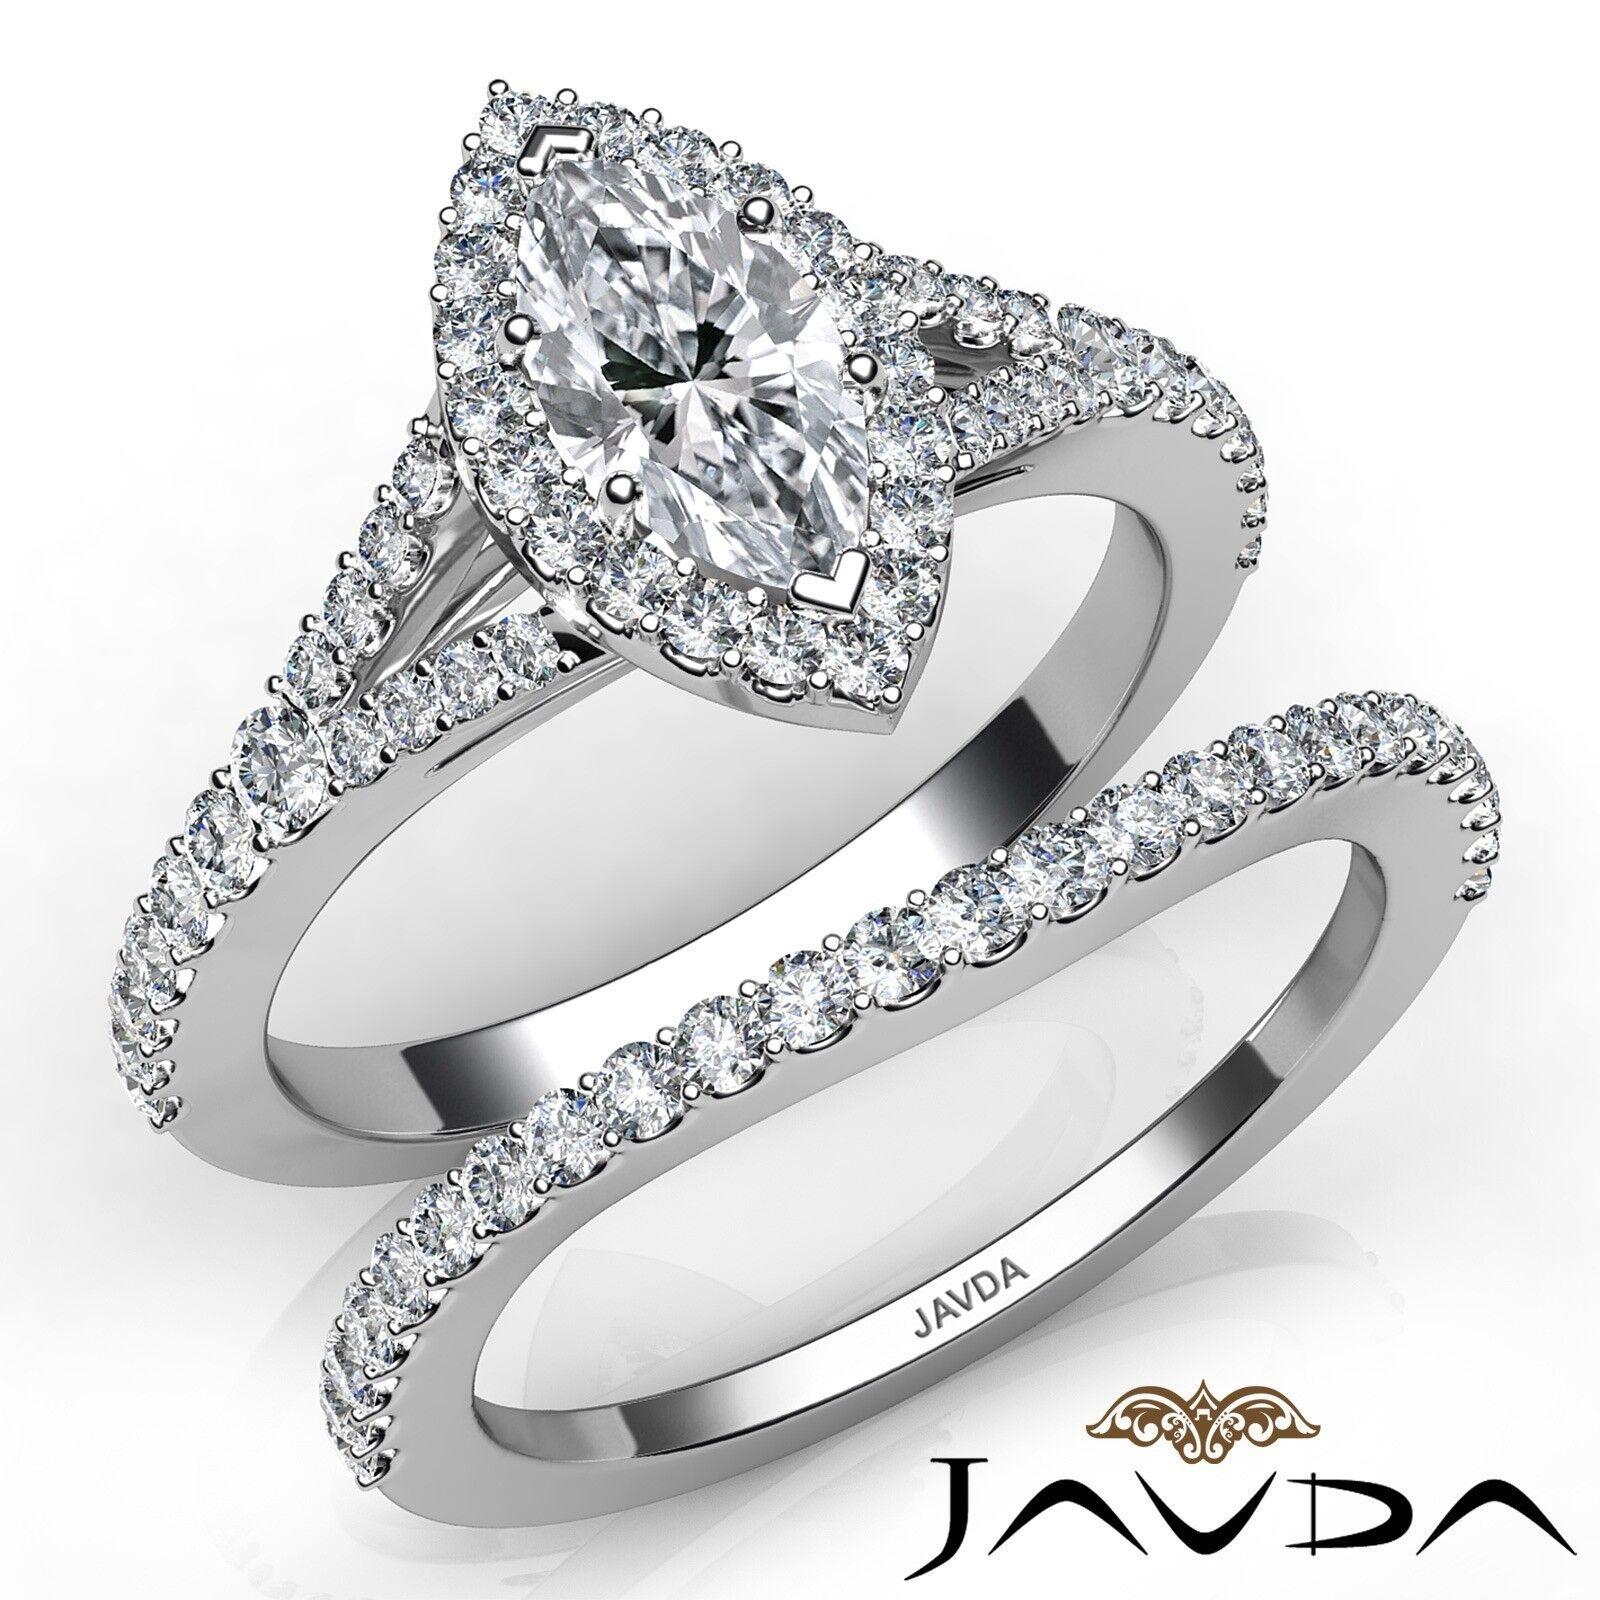 2.02ctw Halo Bridal Set Split Shank Marquise Diamond Engagement Ring GIA F-SI1